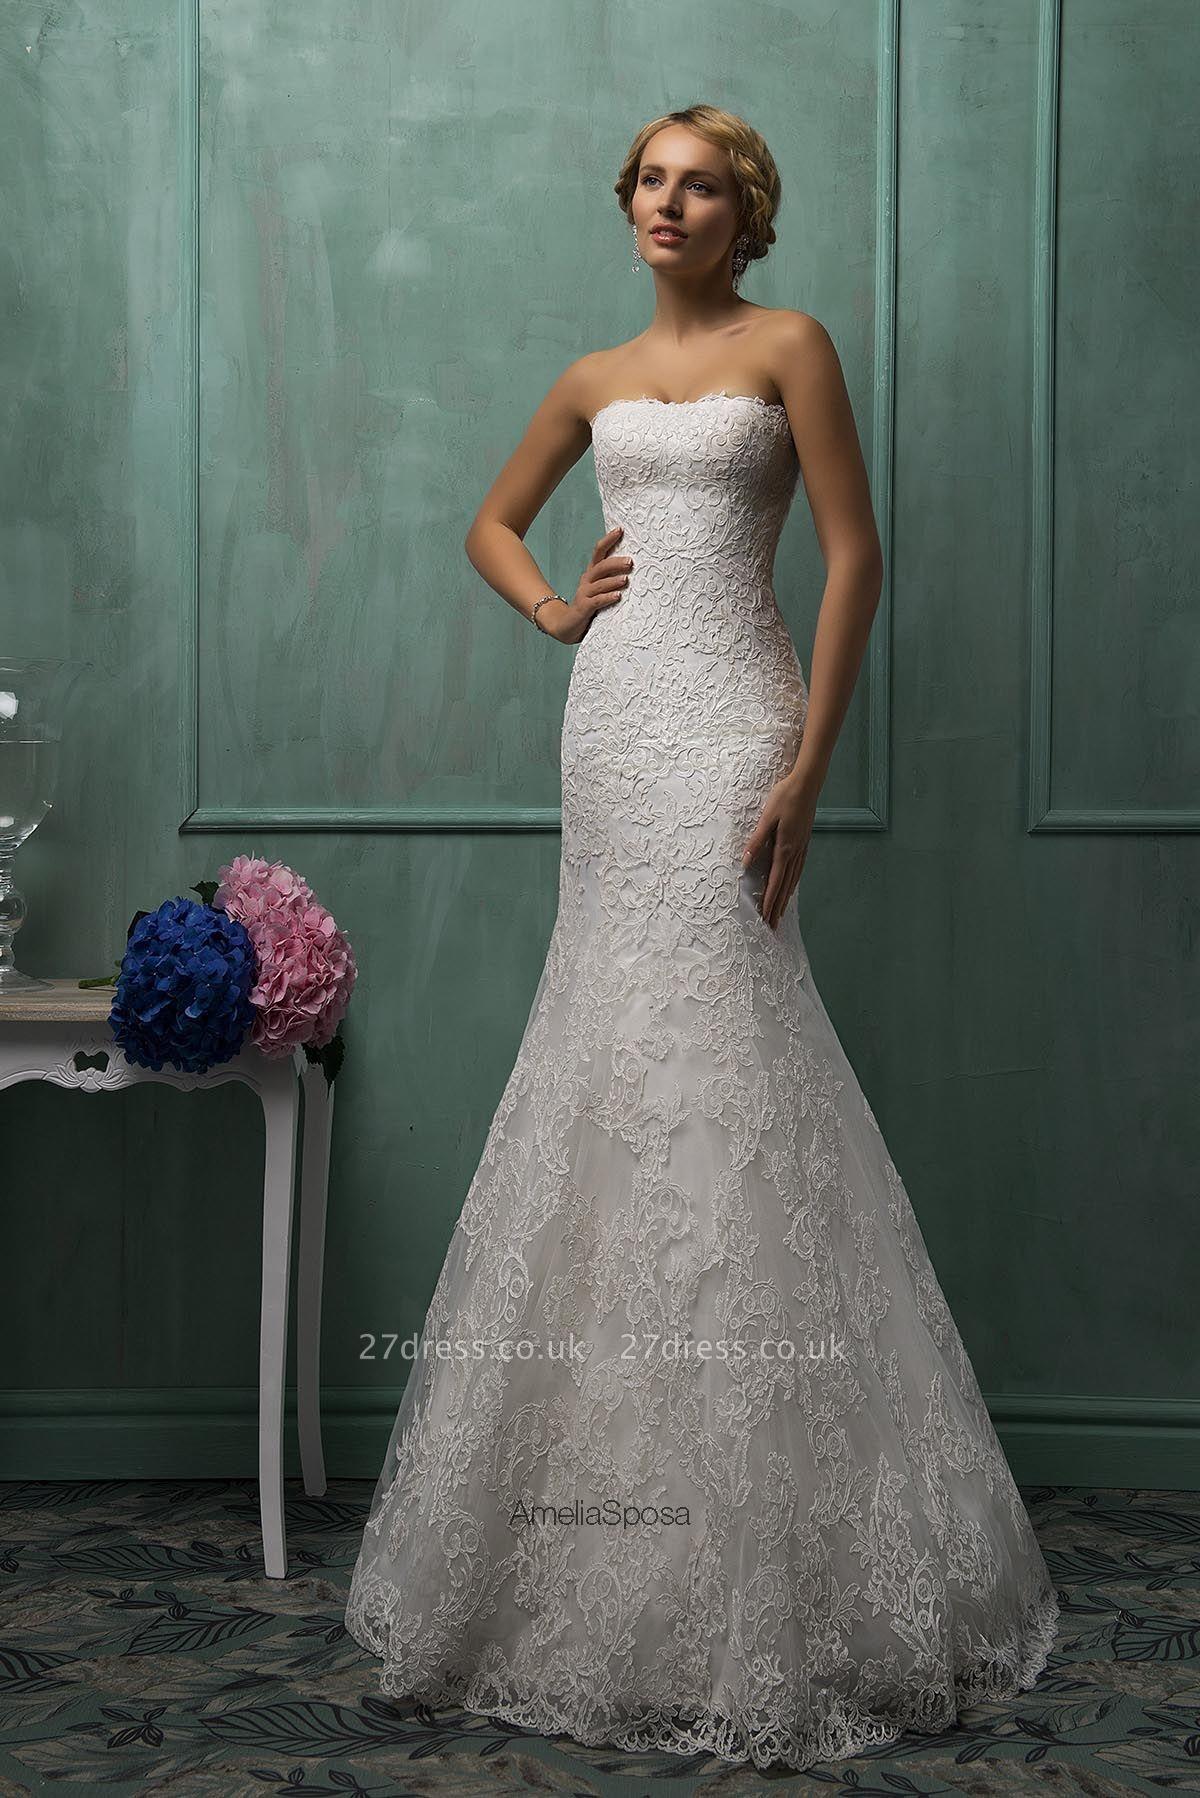 Elegant Strapless Sleeveless Lace Sexy Mermaid Wedding Dress Detachable Half-sleeve